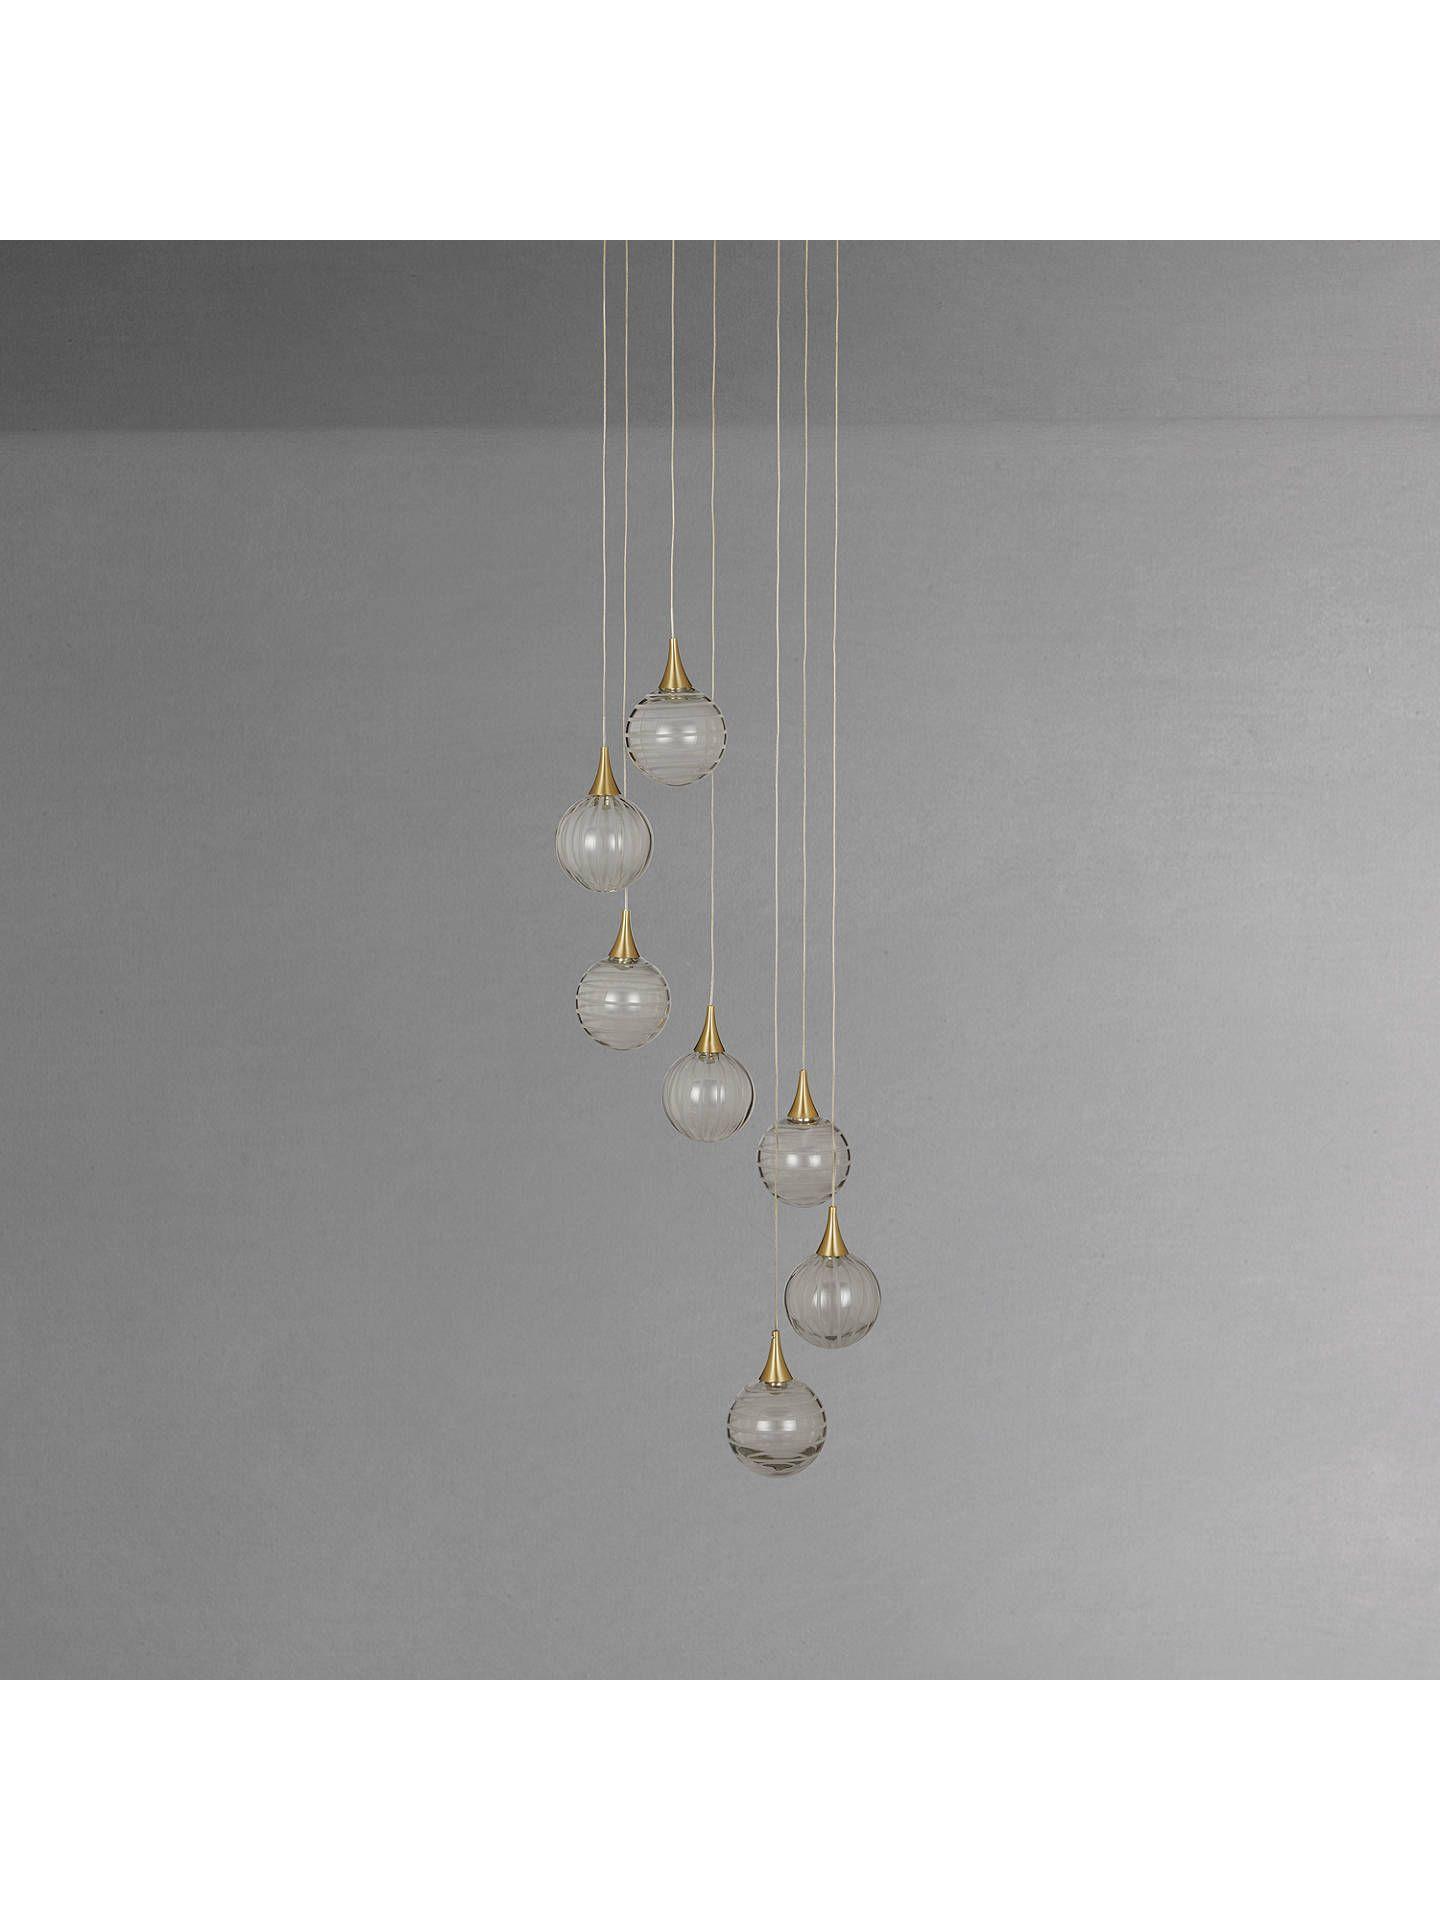 0c3b65326a31 BuyJohn Lewis & Partners Marlo 7 Pendant LED Cluster Ceiling Light, Gold  Online at johnlewis.com